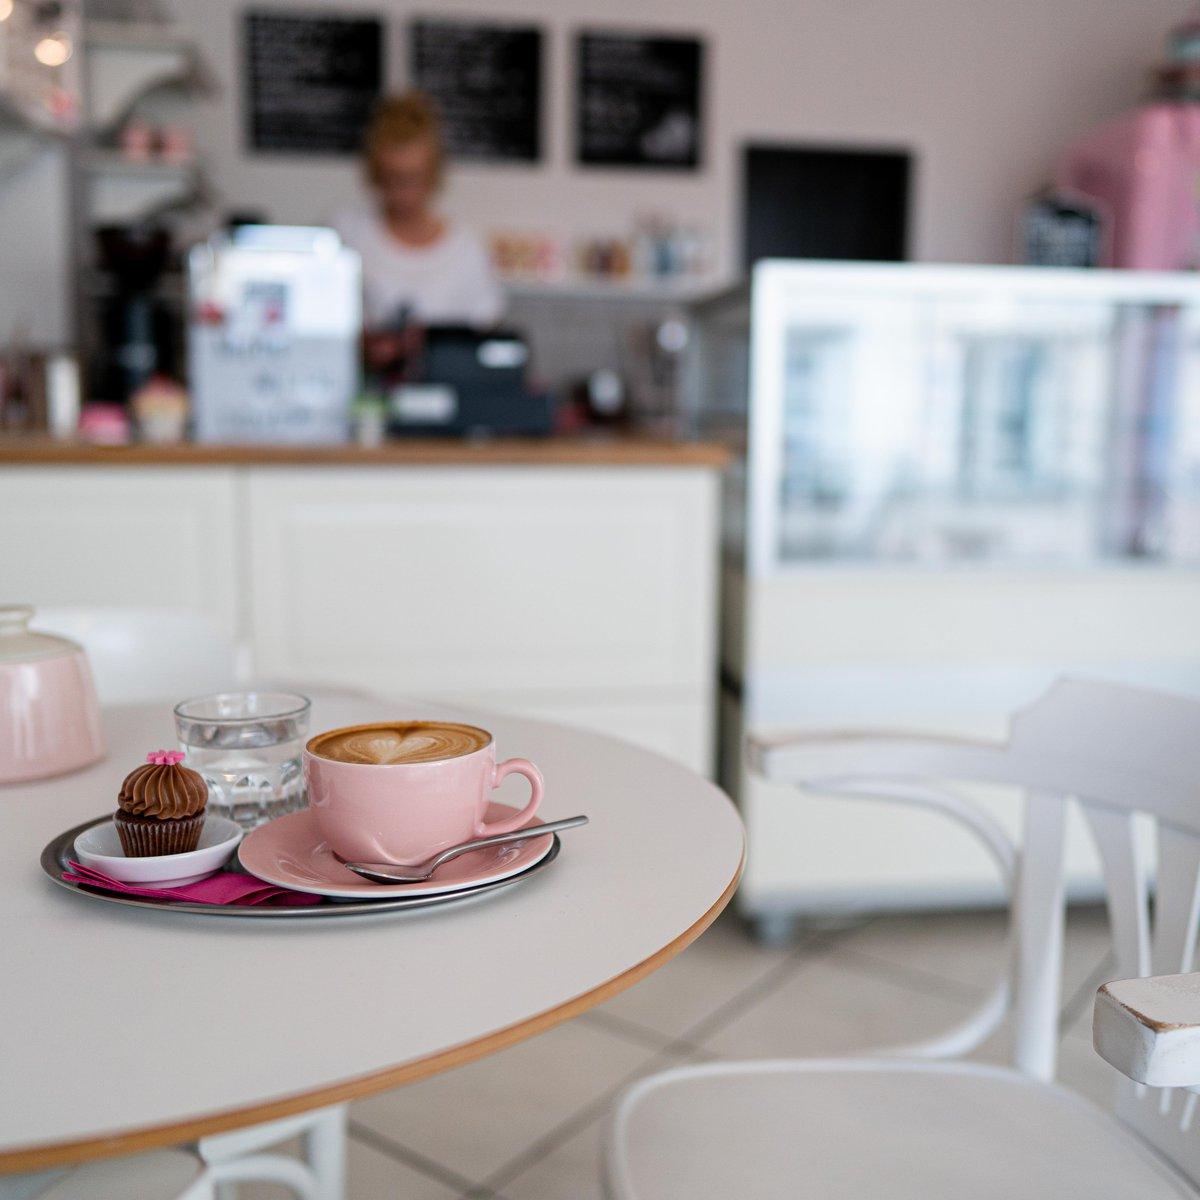 Kaffee und Mini Cupcake